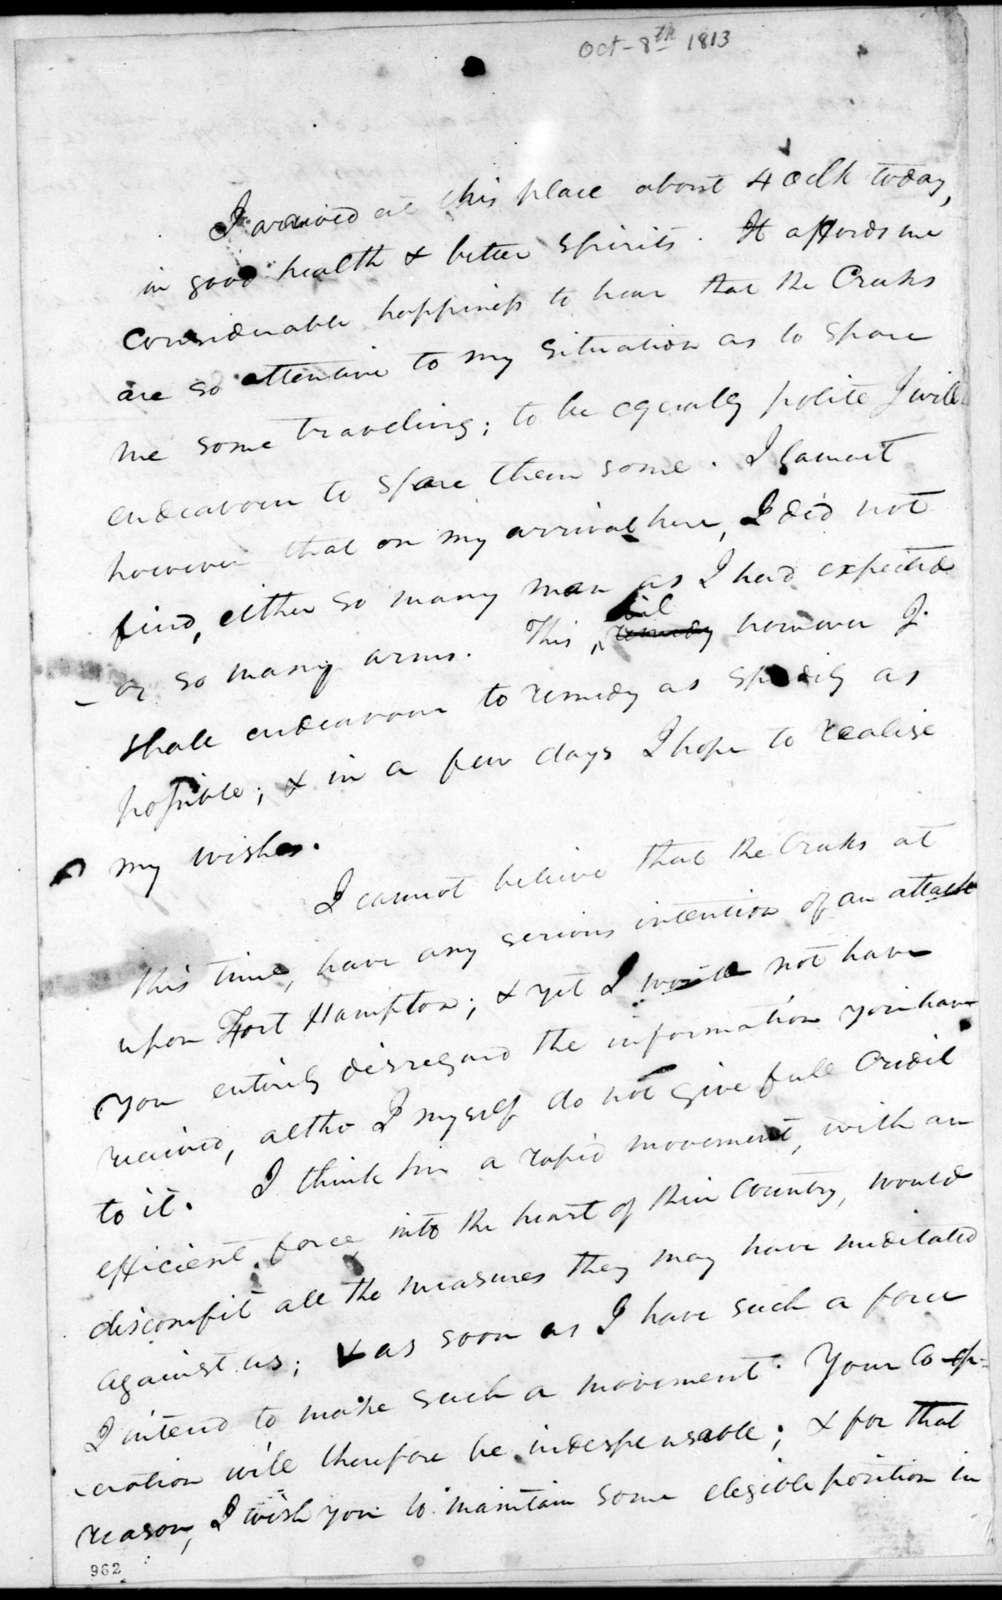 Andrew Jackson to John Coffee, October 8, 1813